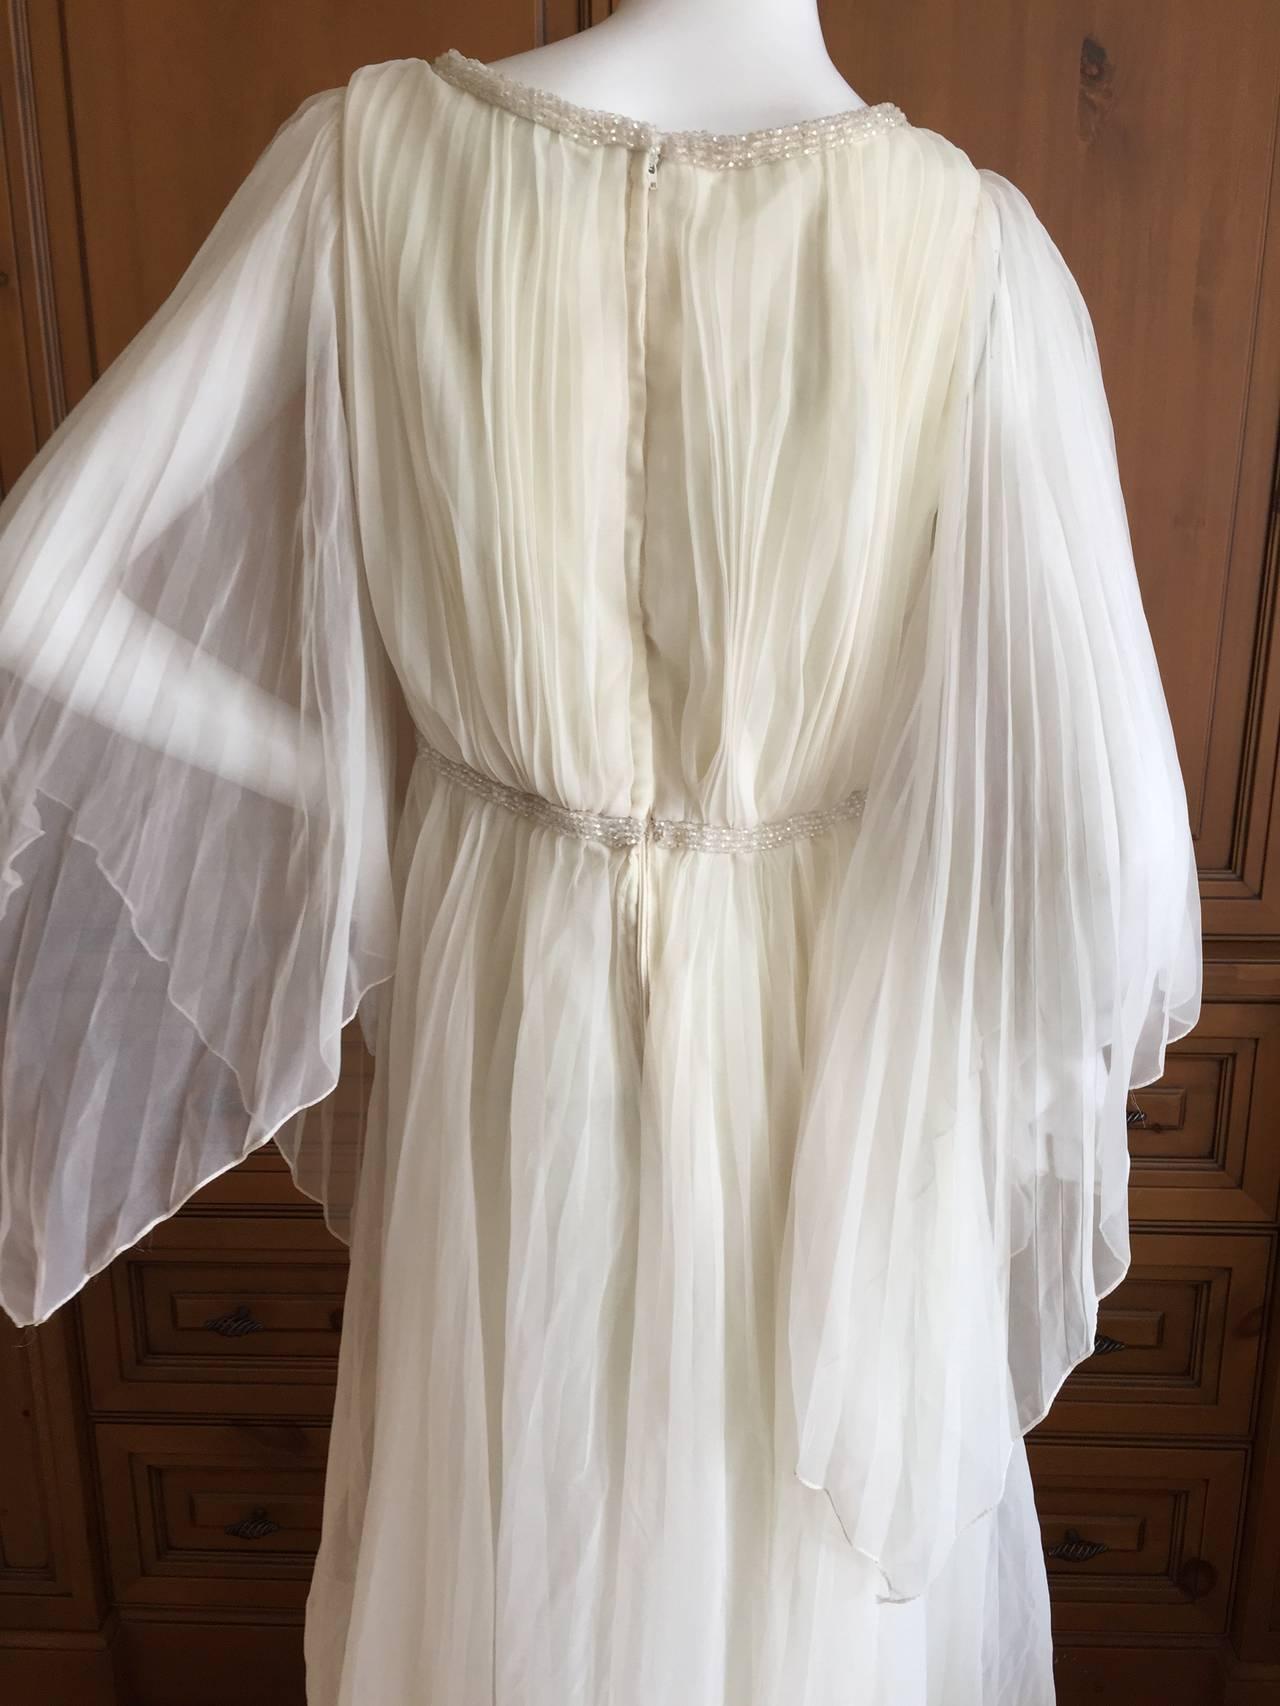 Jean Louis Romantic Ivory Beaded Dress 10